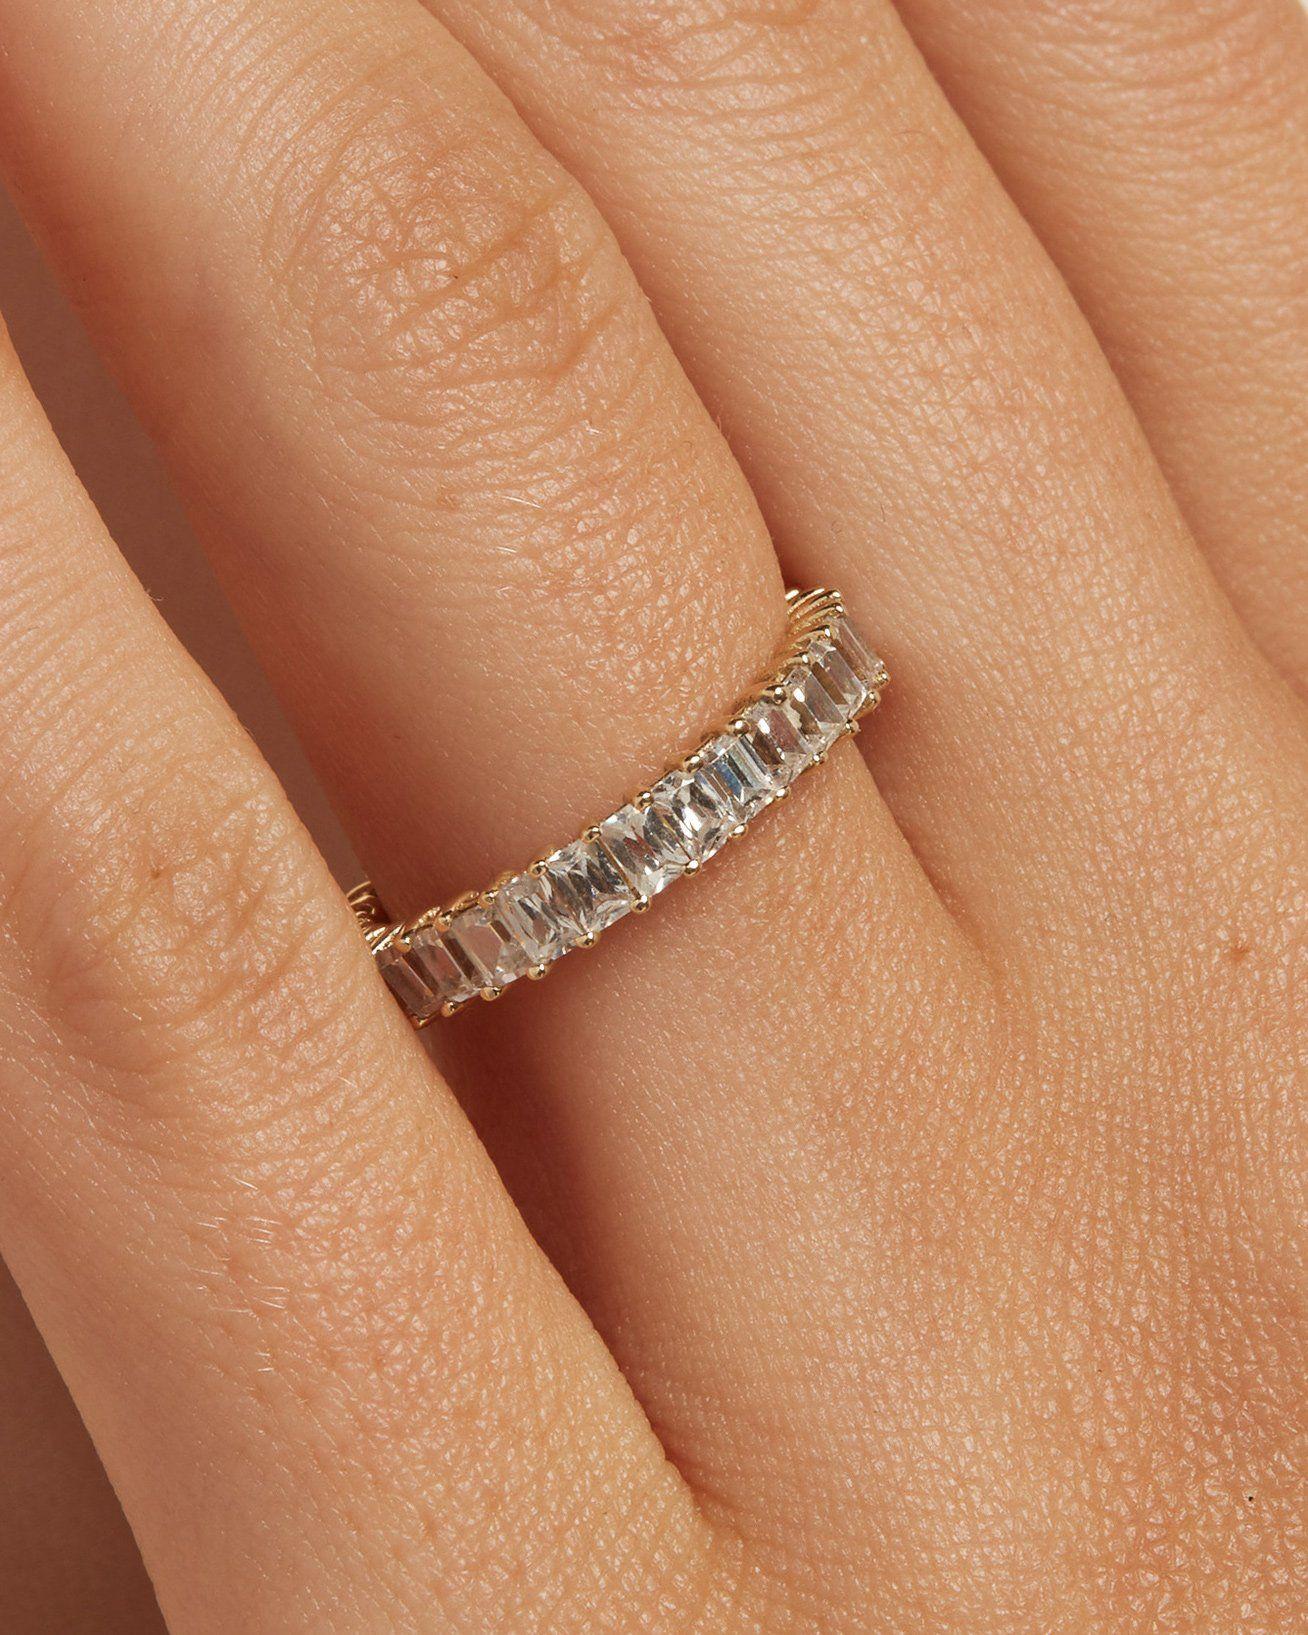 The Ballier Ring- Emerald-Cut 2x3 mm – Après Jewelry